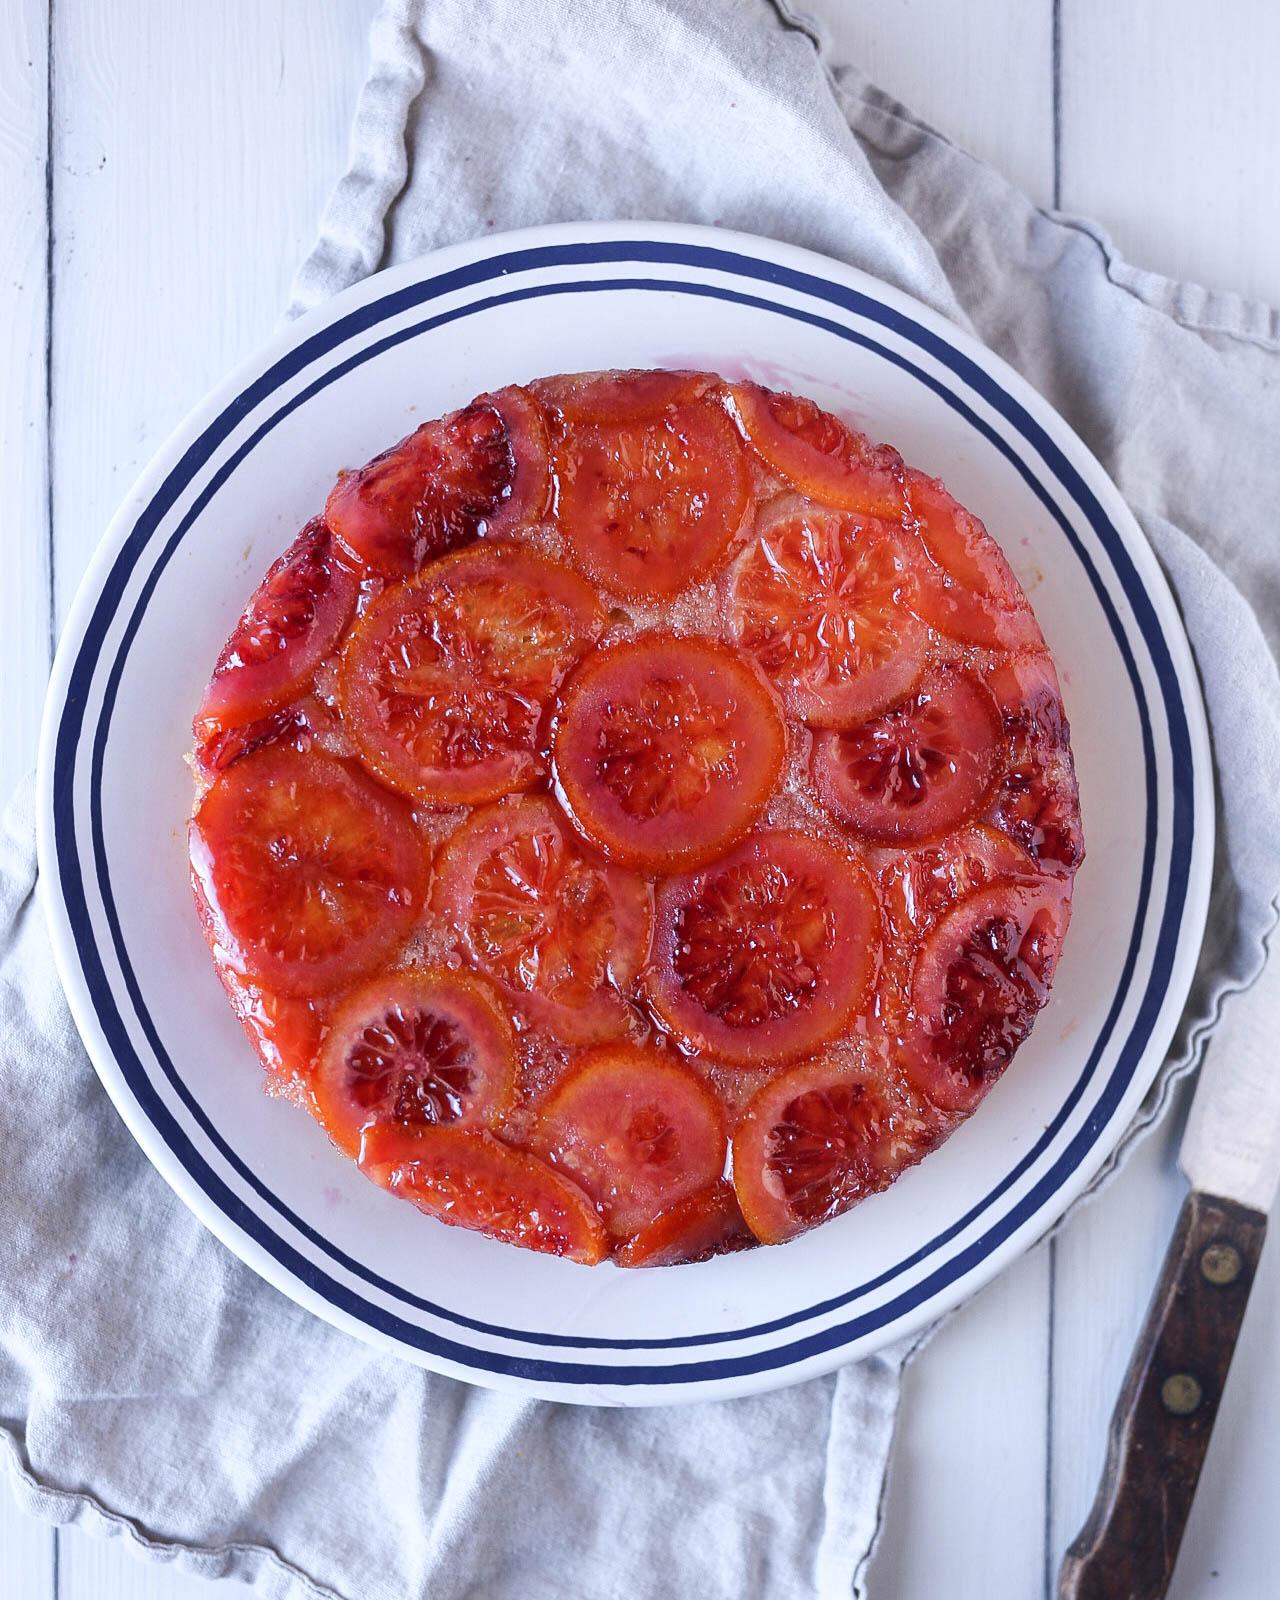 My Favorite Blood Orange Upside Down Cake